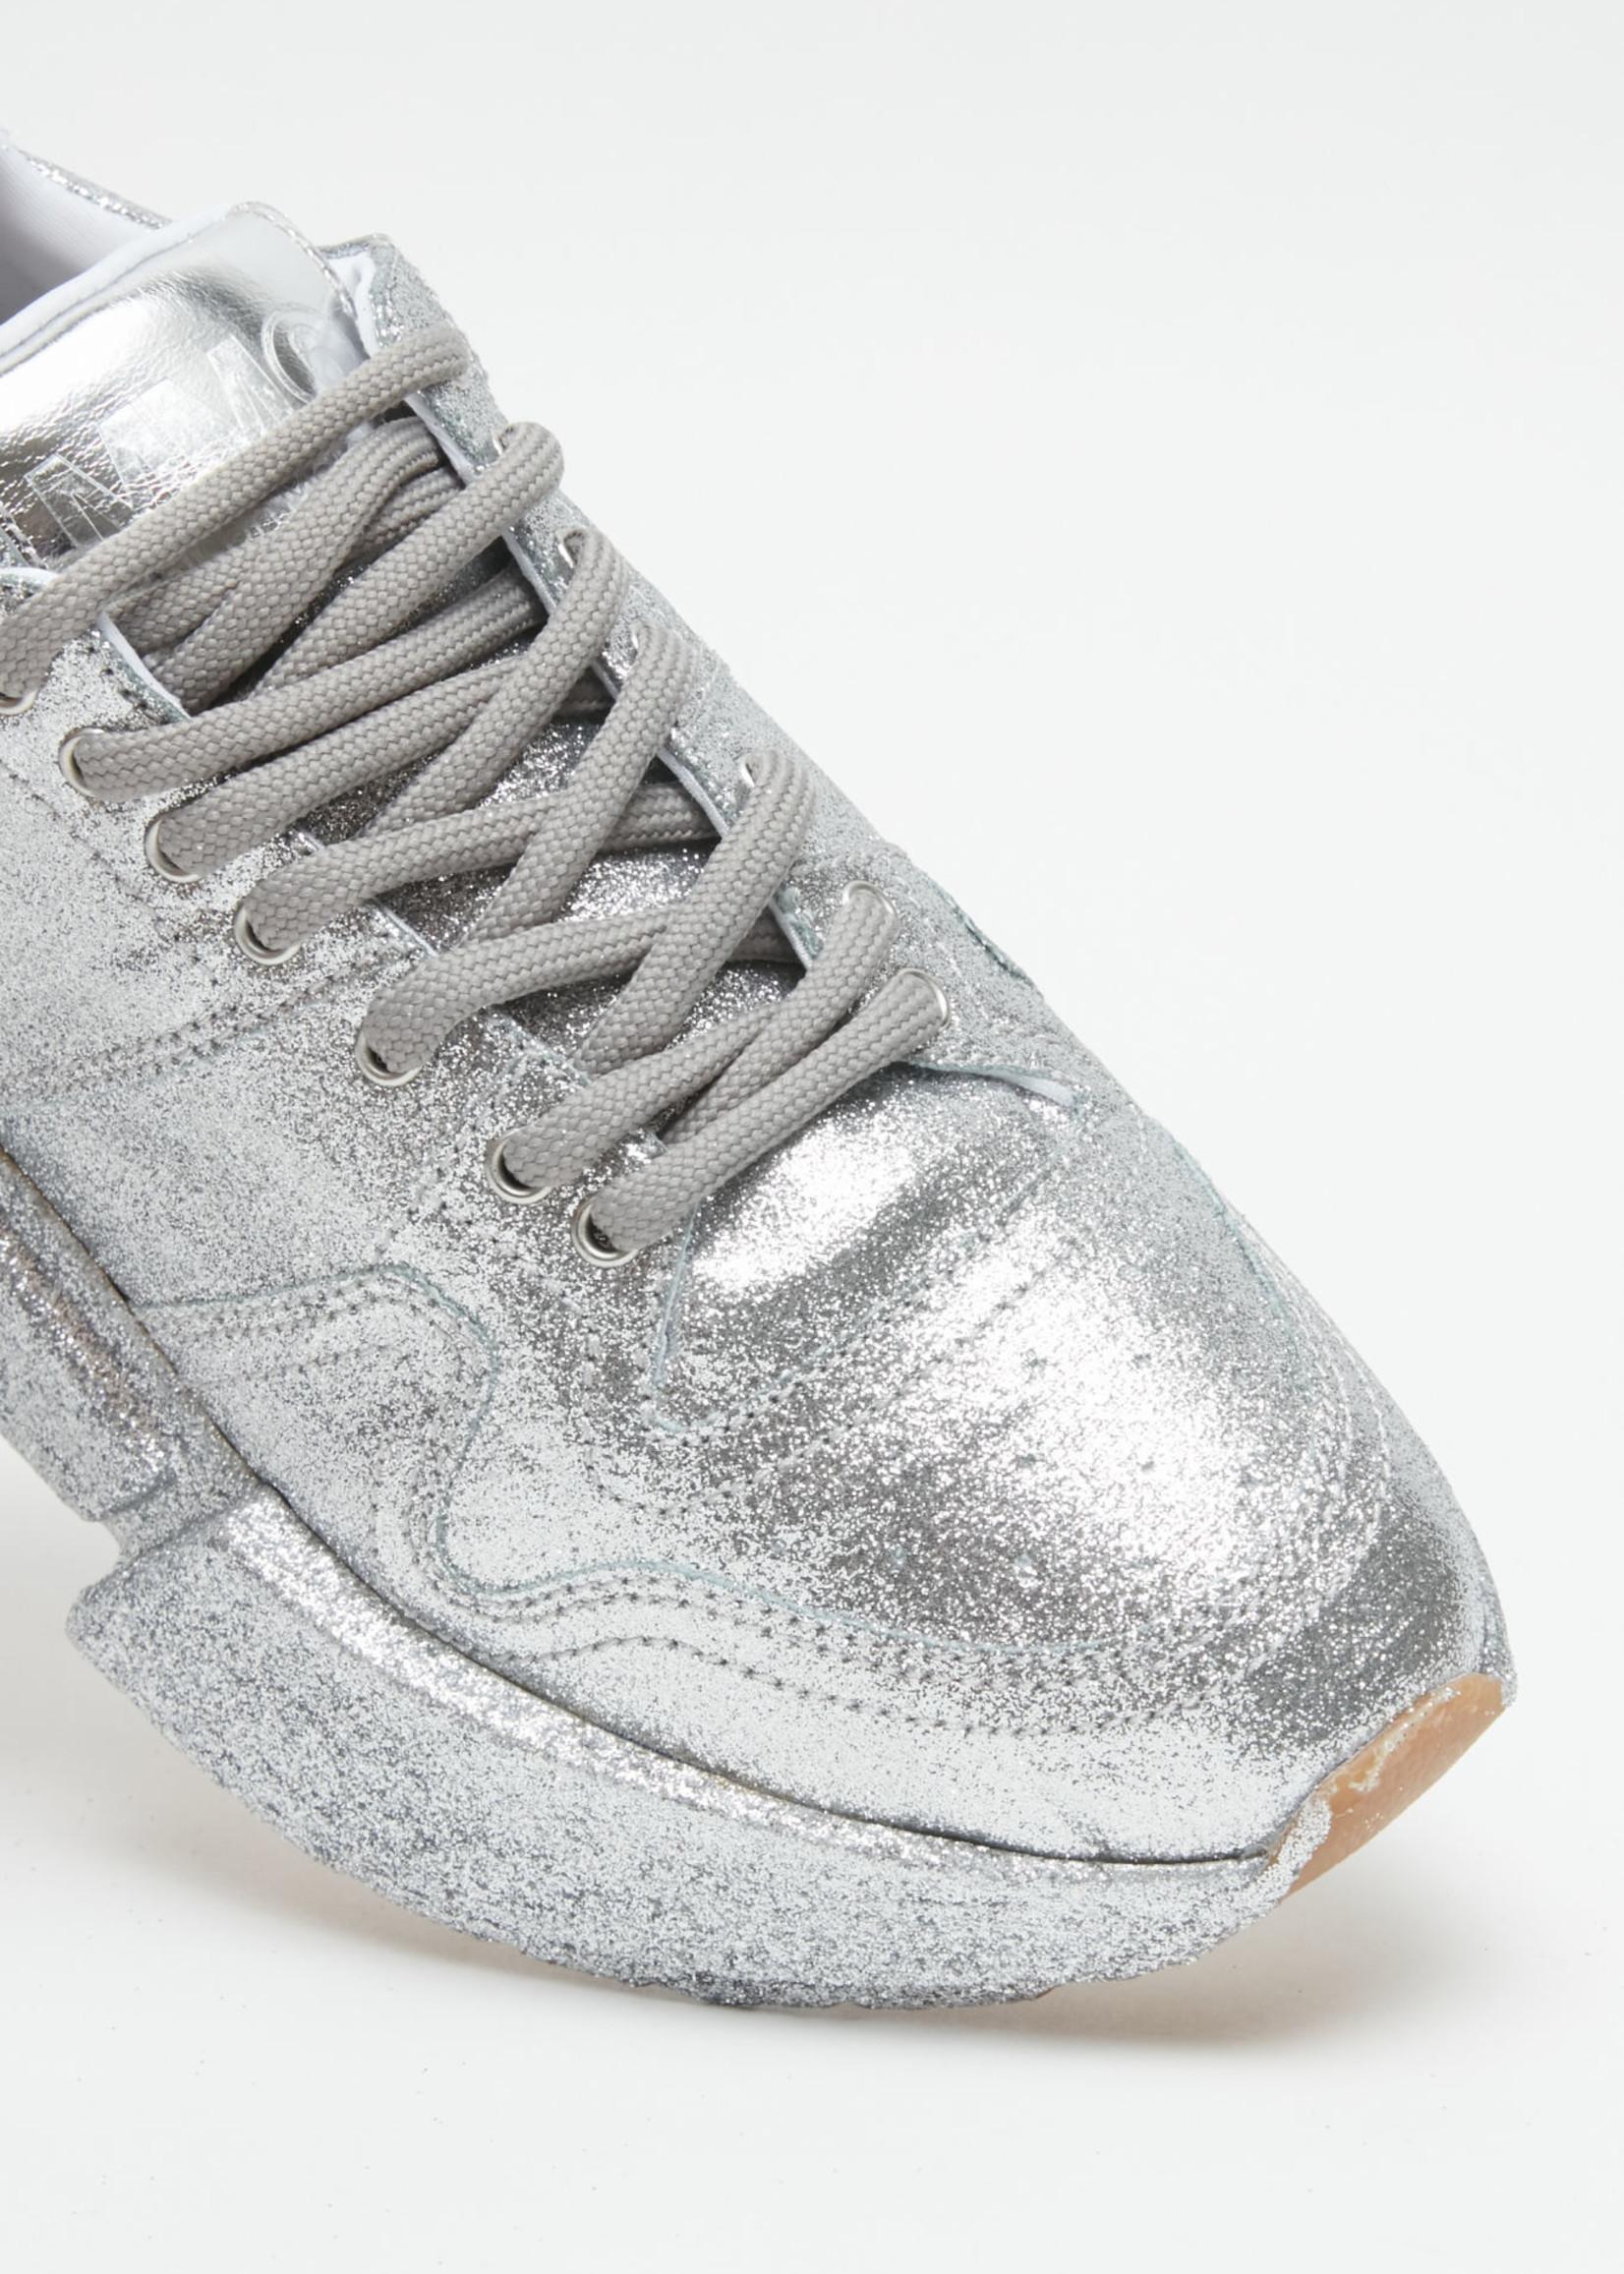 MM6 MAISON MARGIELA Silver Glitter Dipped Sneakers